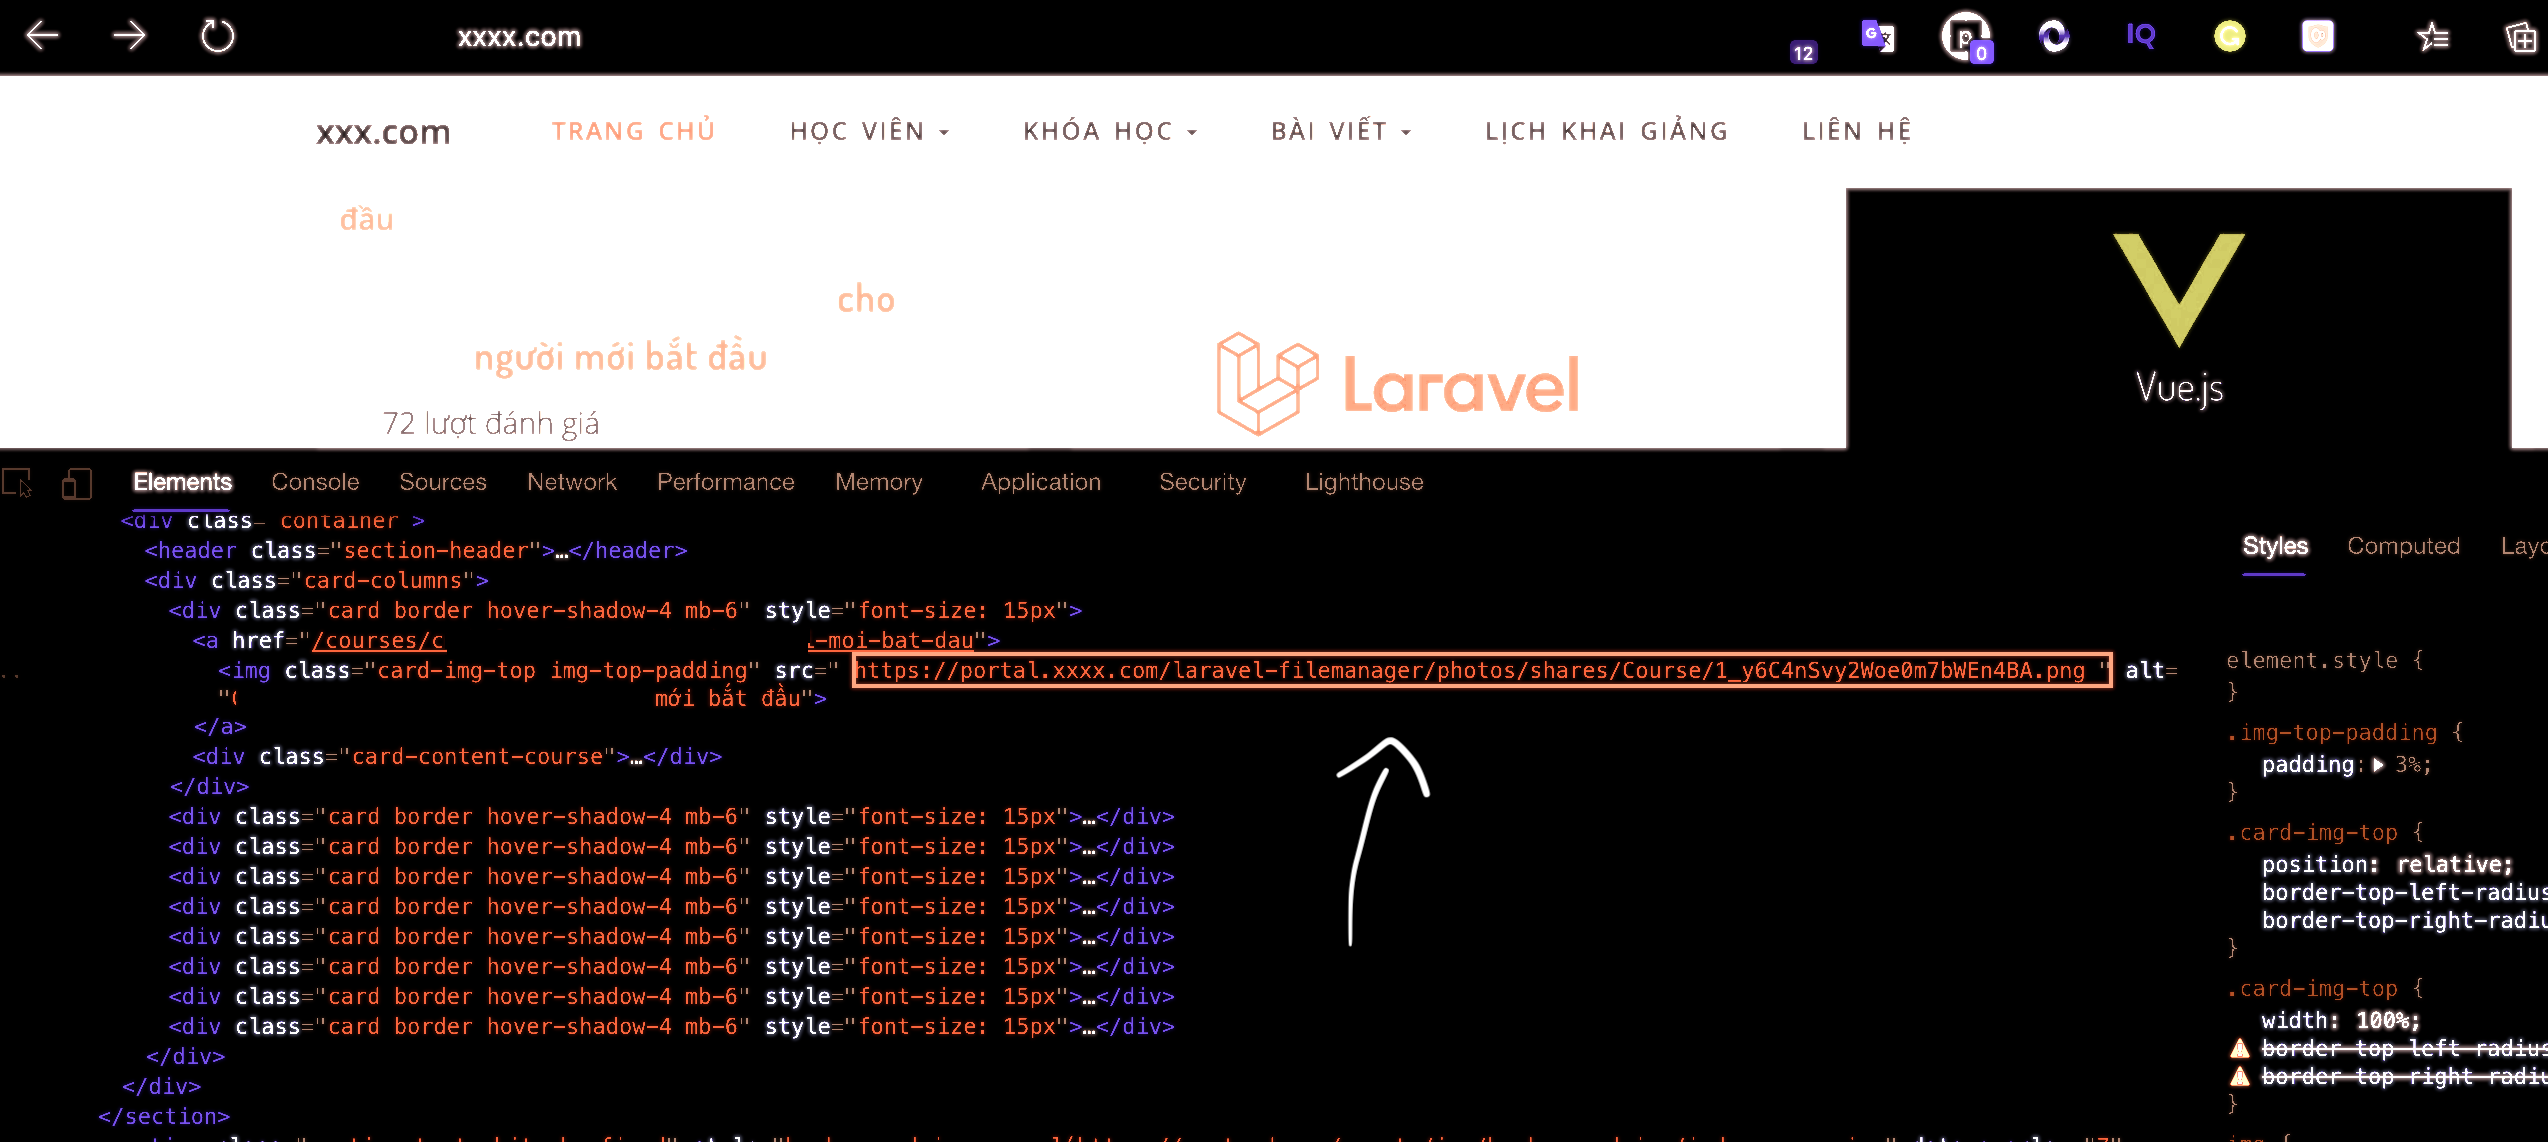 https://manhnv.com/images/posts/hacking/chi-mot-buoi-chieu-toi-da-chiem-quyen-dieu-khien-server-cua-8-website-nhu-the-nao/Screen_Shot_2021-01-14_at_18.43.42.png